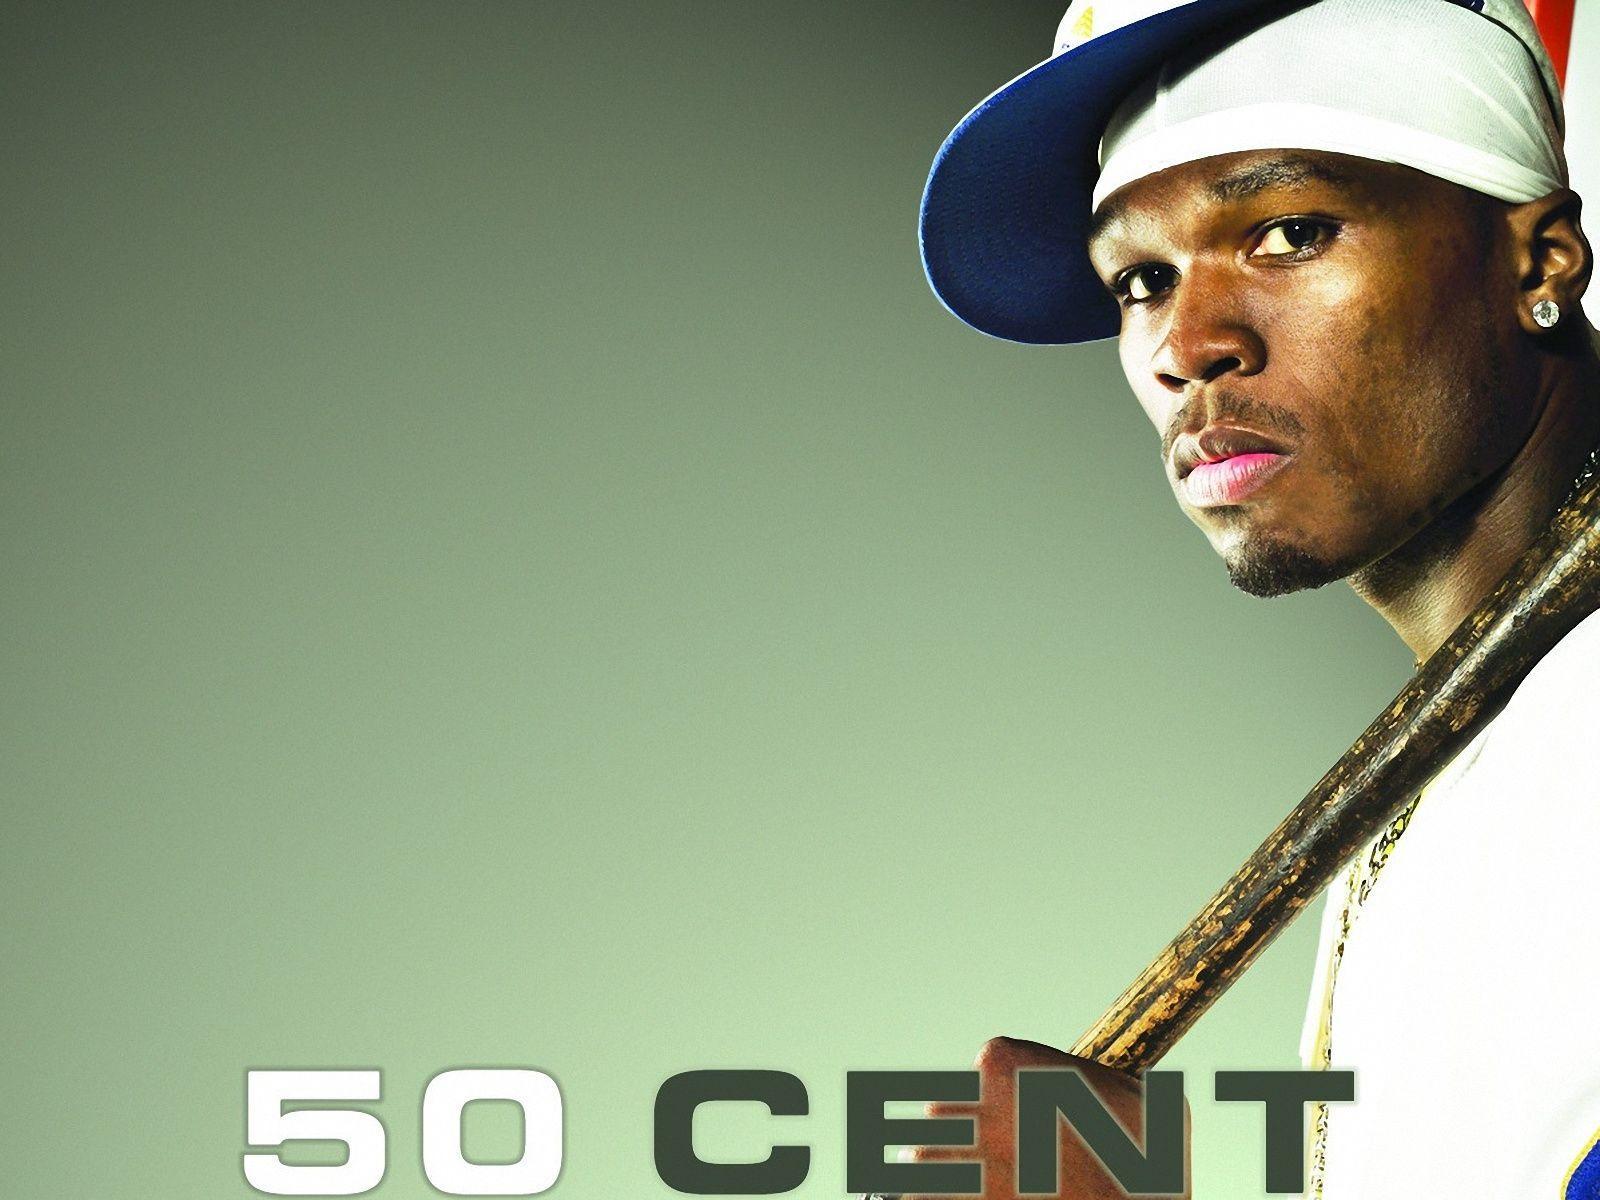 Cartoon 50 Cent Wallpapers Top Free Cartoon 50 Cent Backgrounds Wallpaperaccess